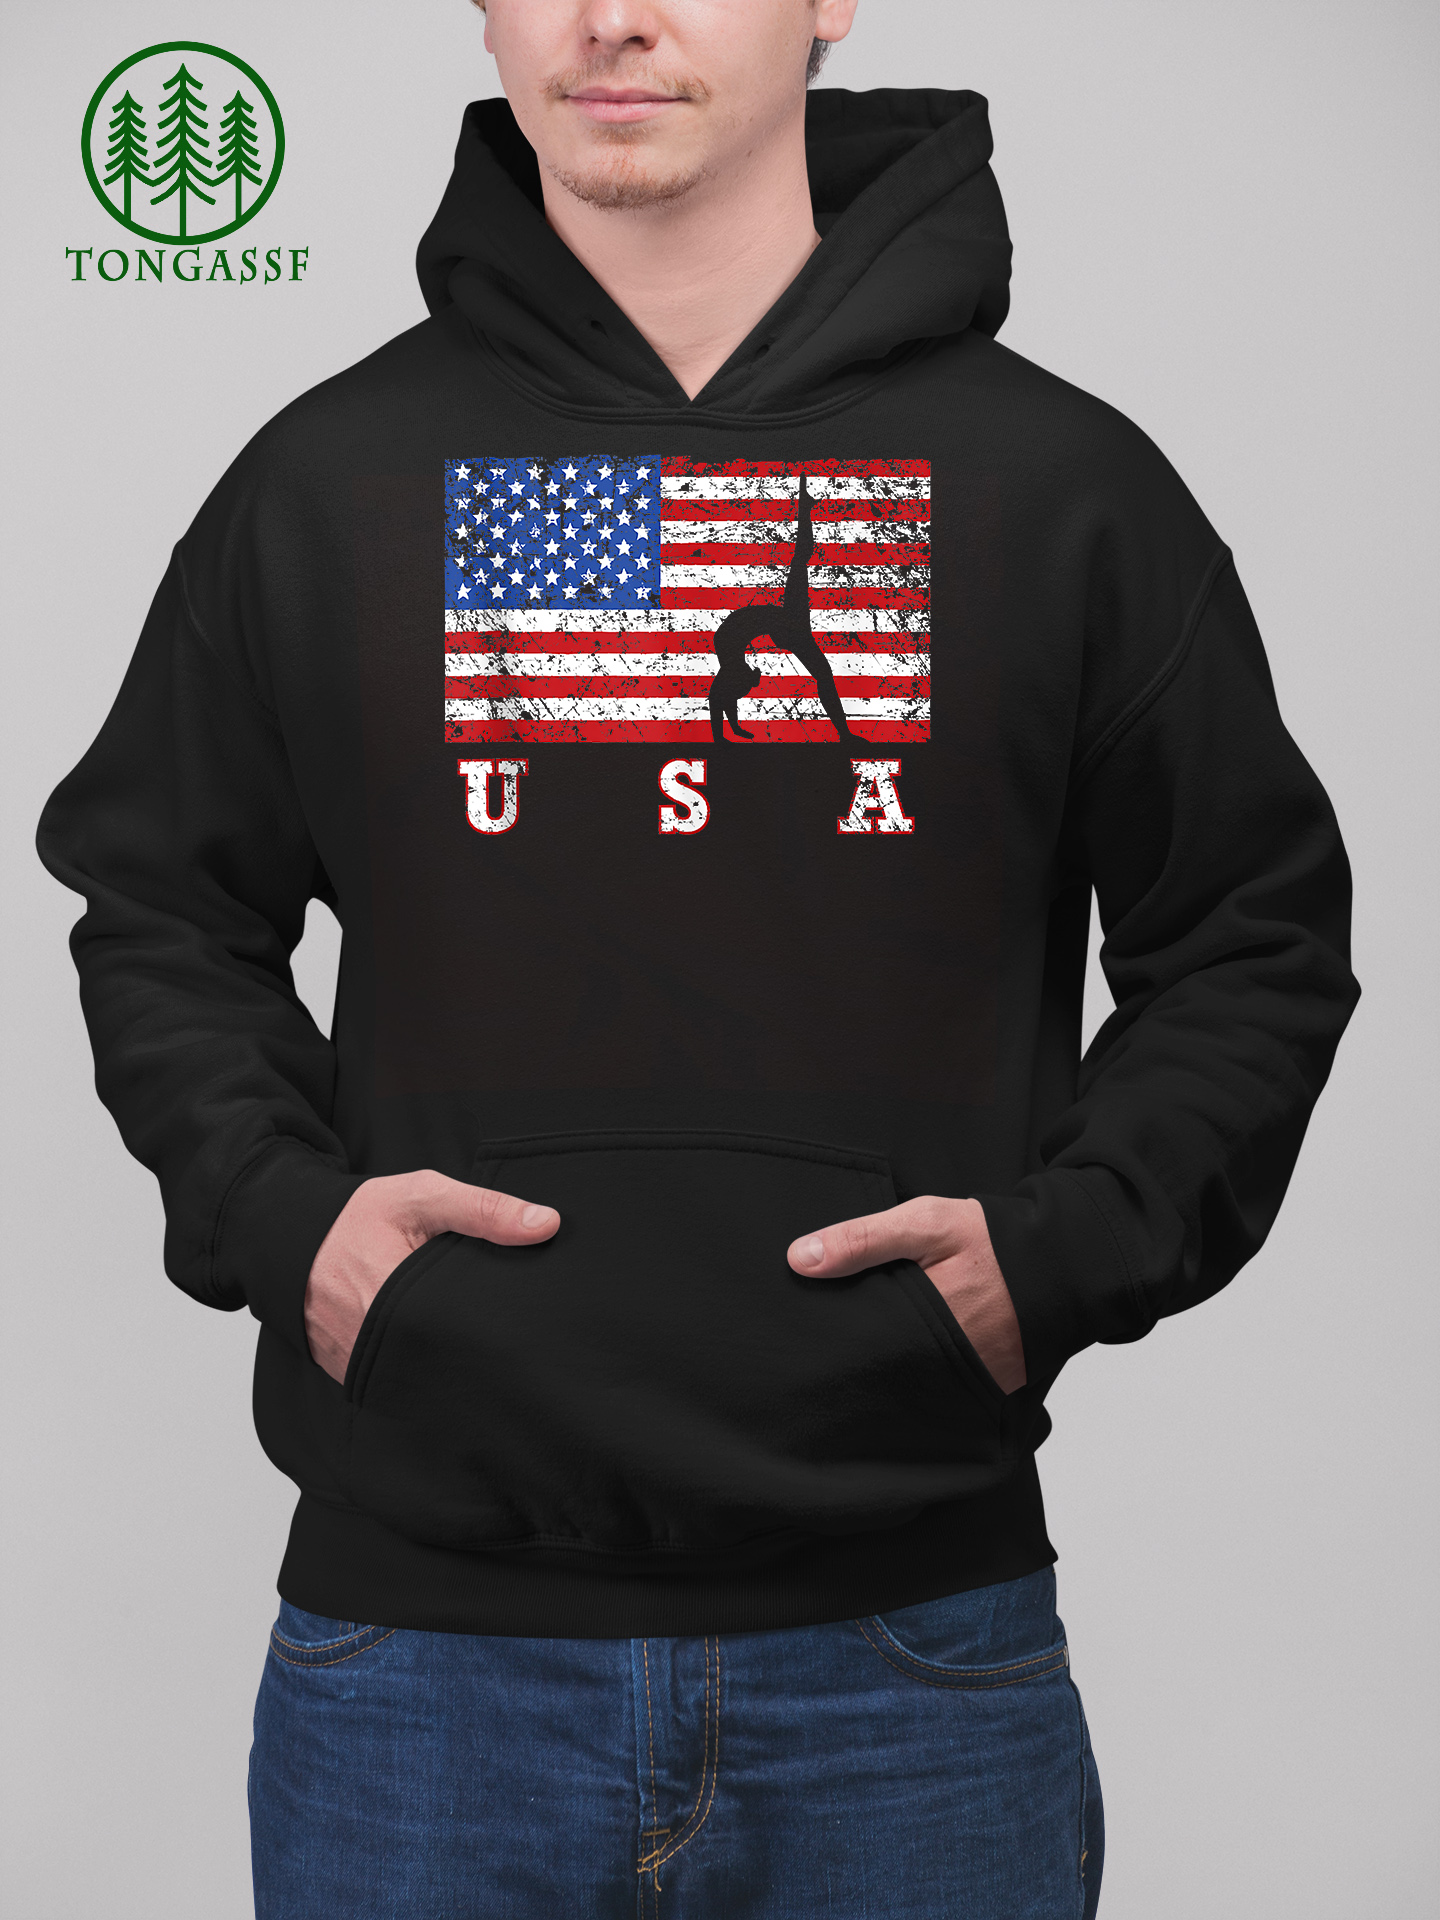 American Flag Gymnastics USA Gift Tumbling Team Hoodie